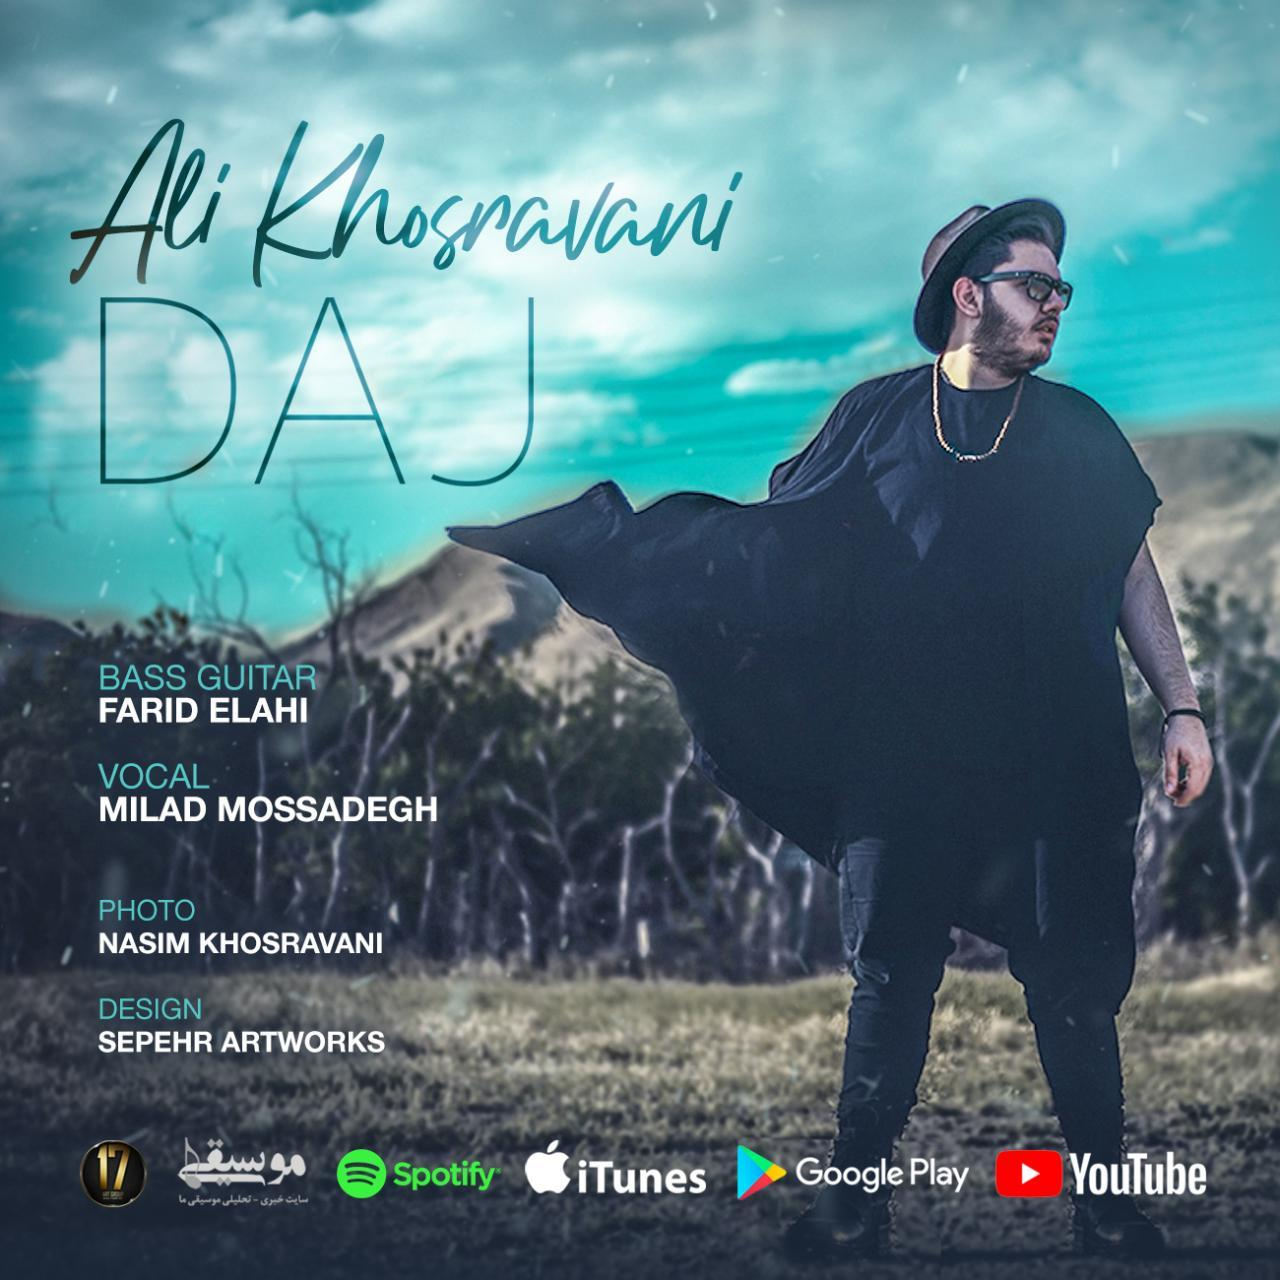 Ali Khosravani - Daj